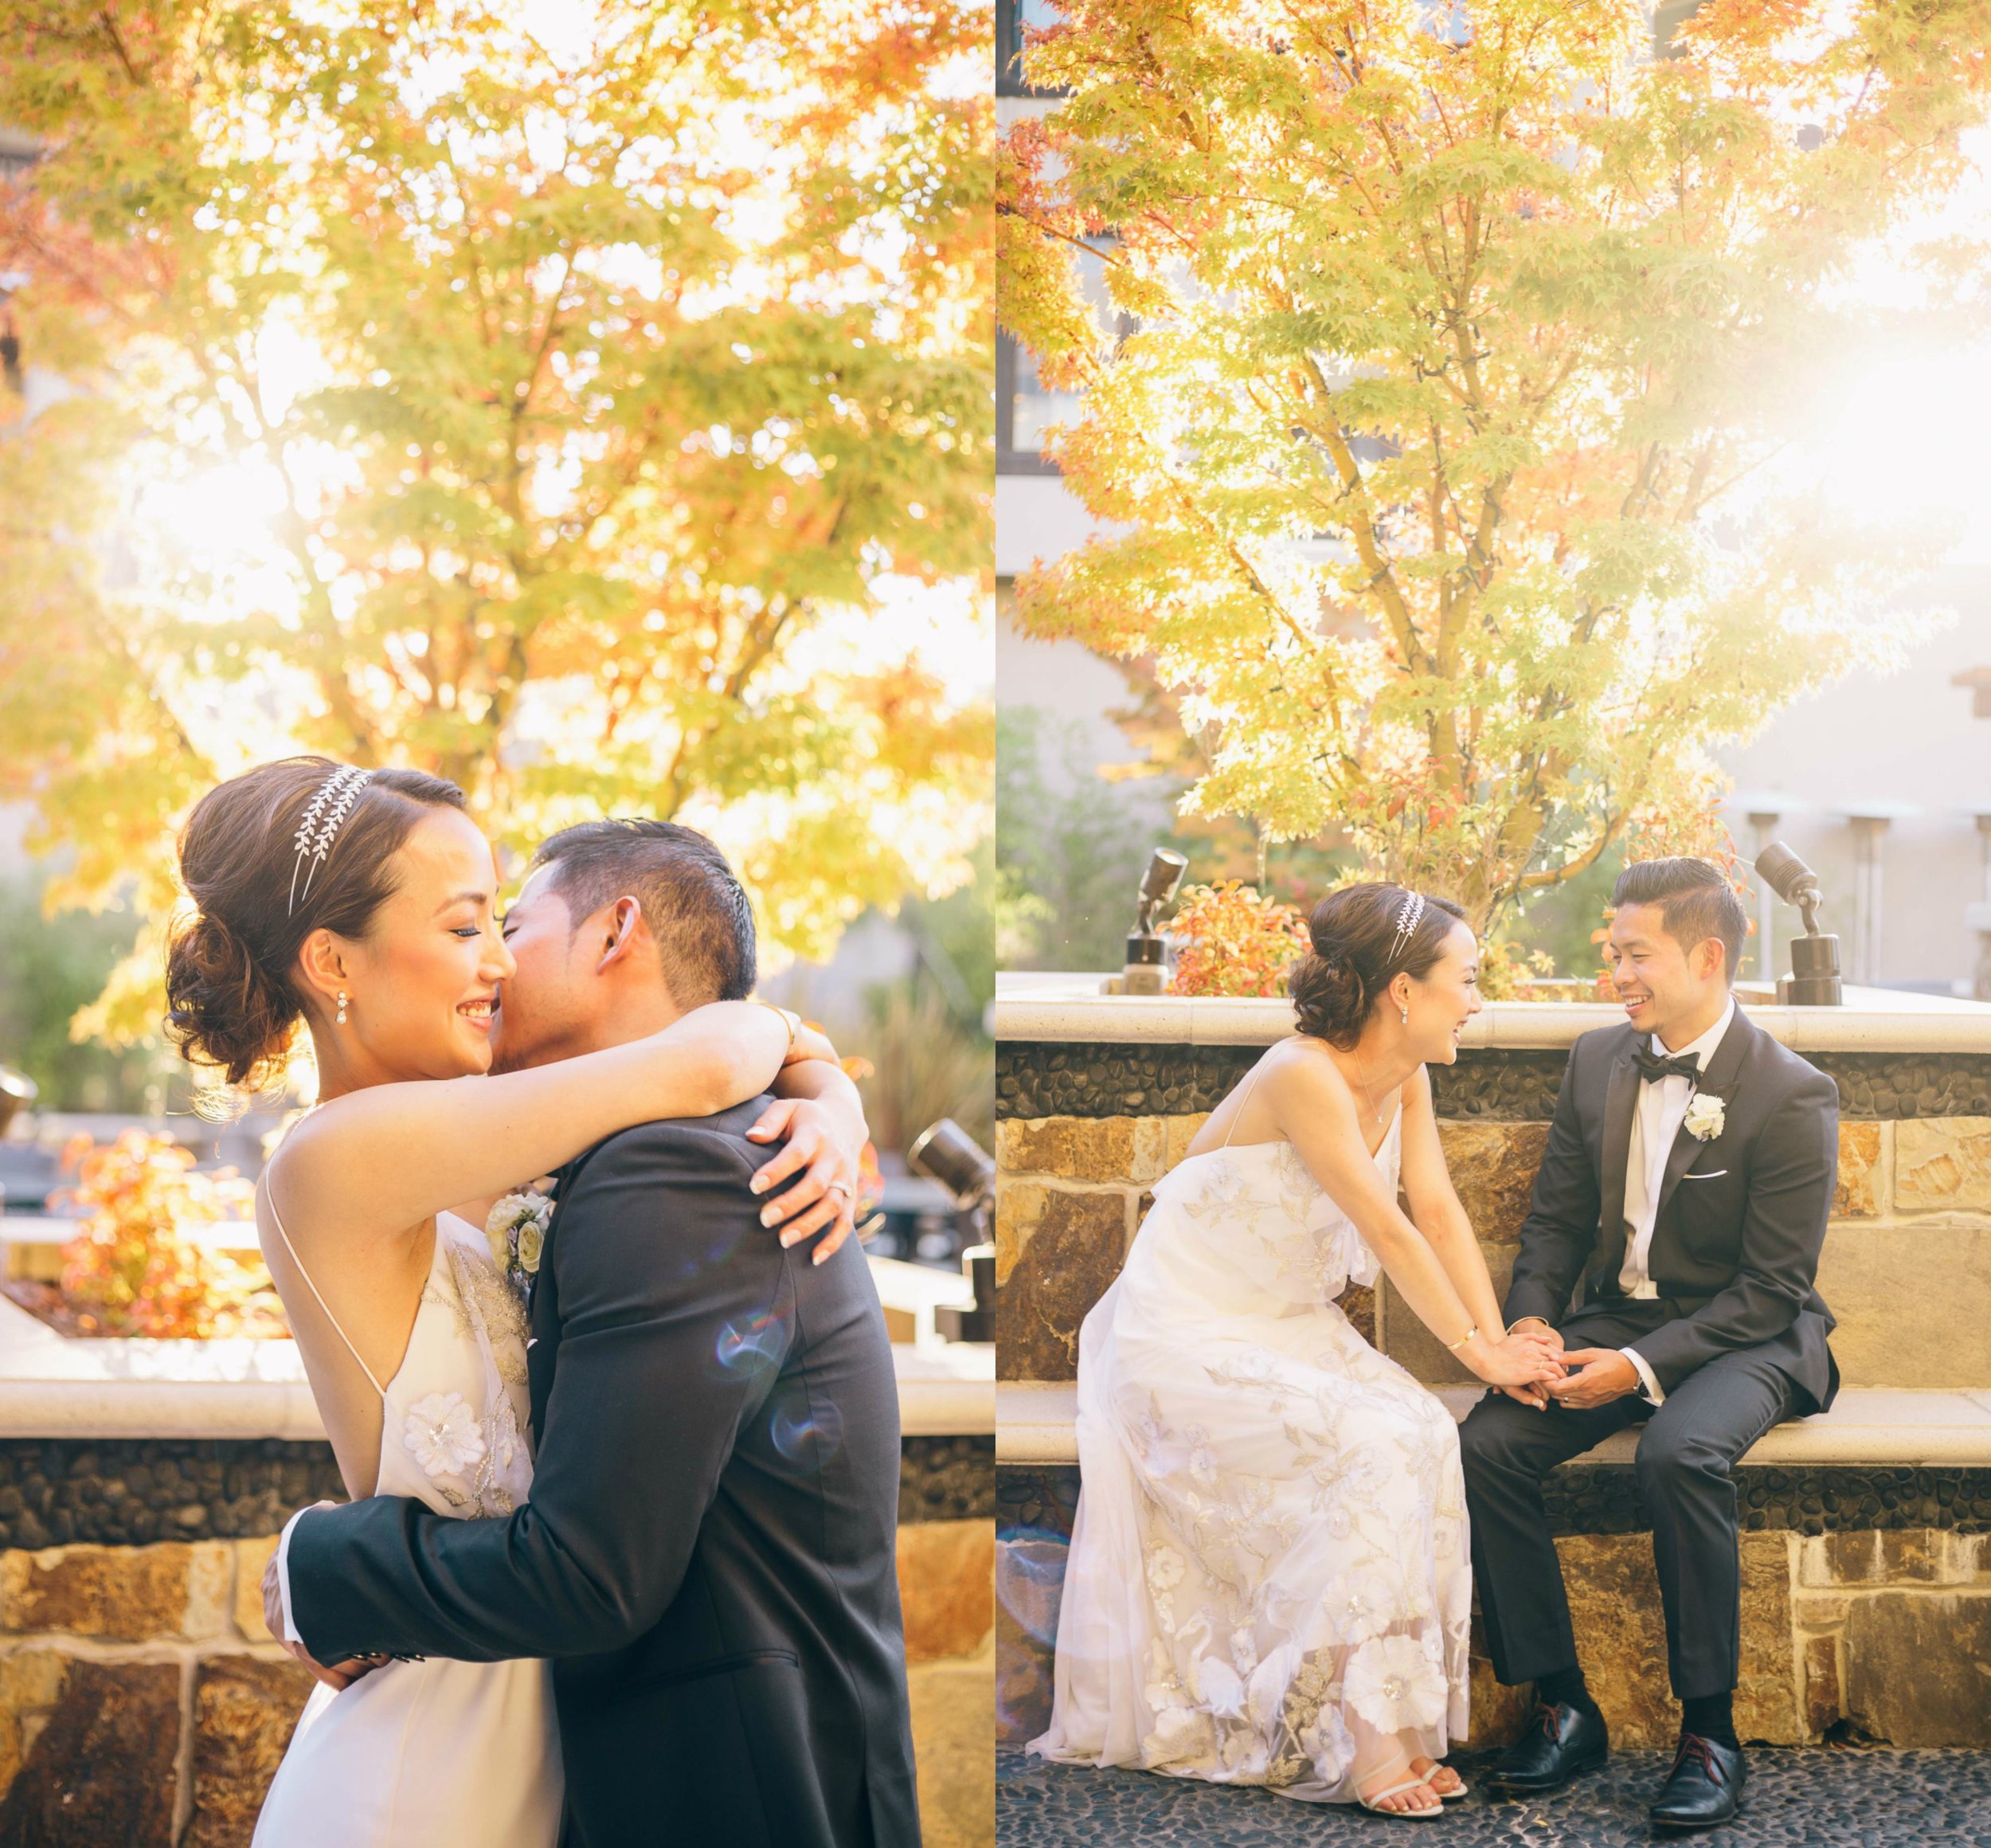 Westin Verasa Wedding at La Toque - JBJ Pictures Wedding Photographer in Napa Sonoma and San Francisco - 1 (29).jpg